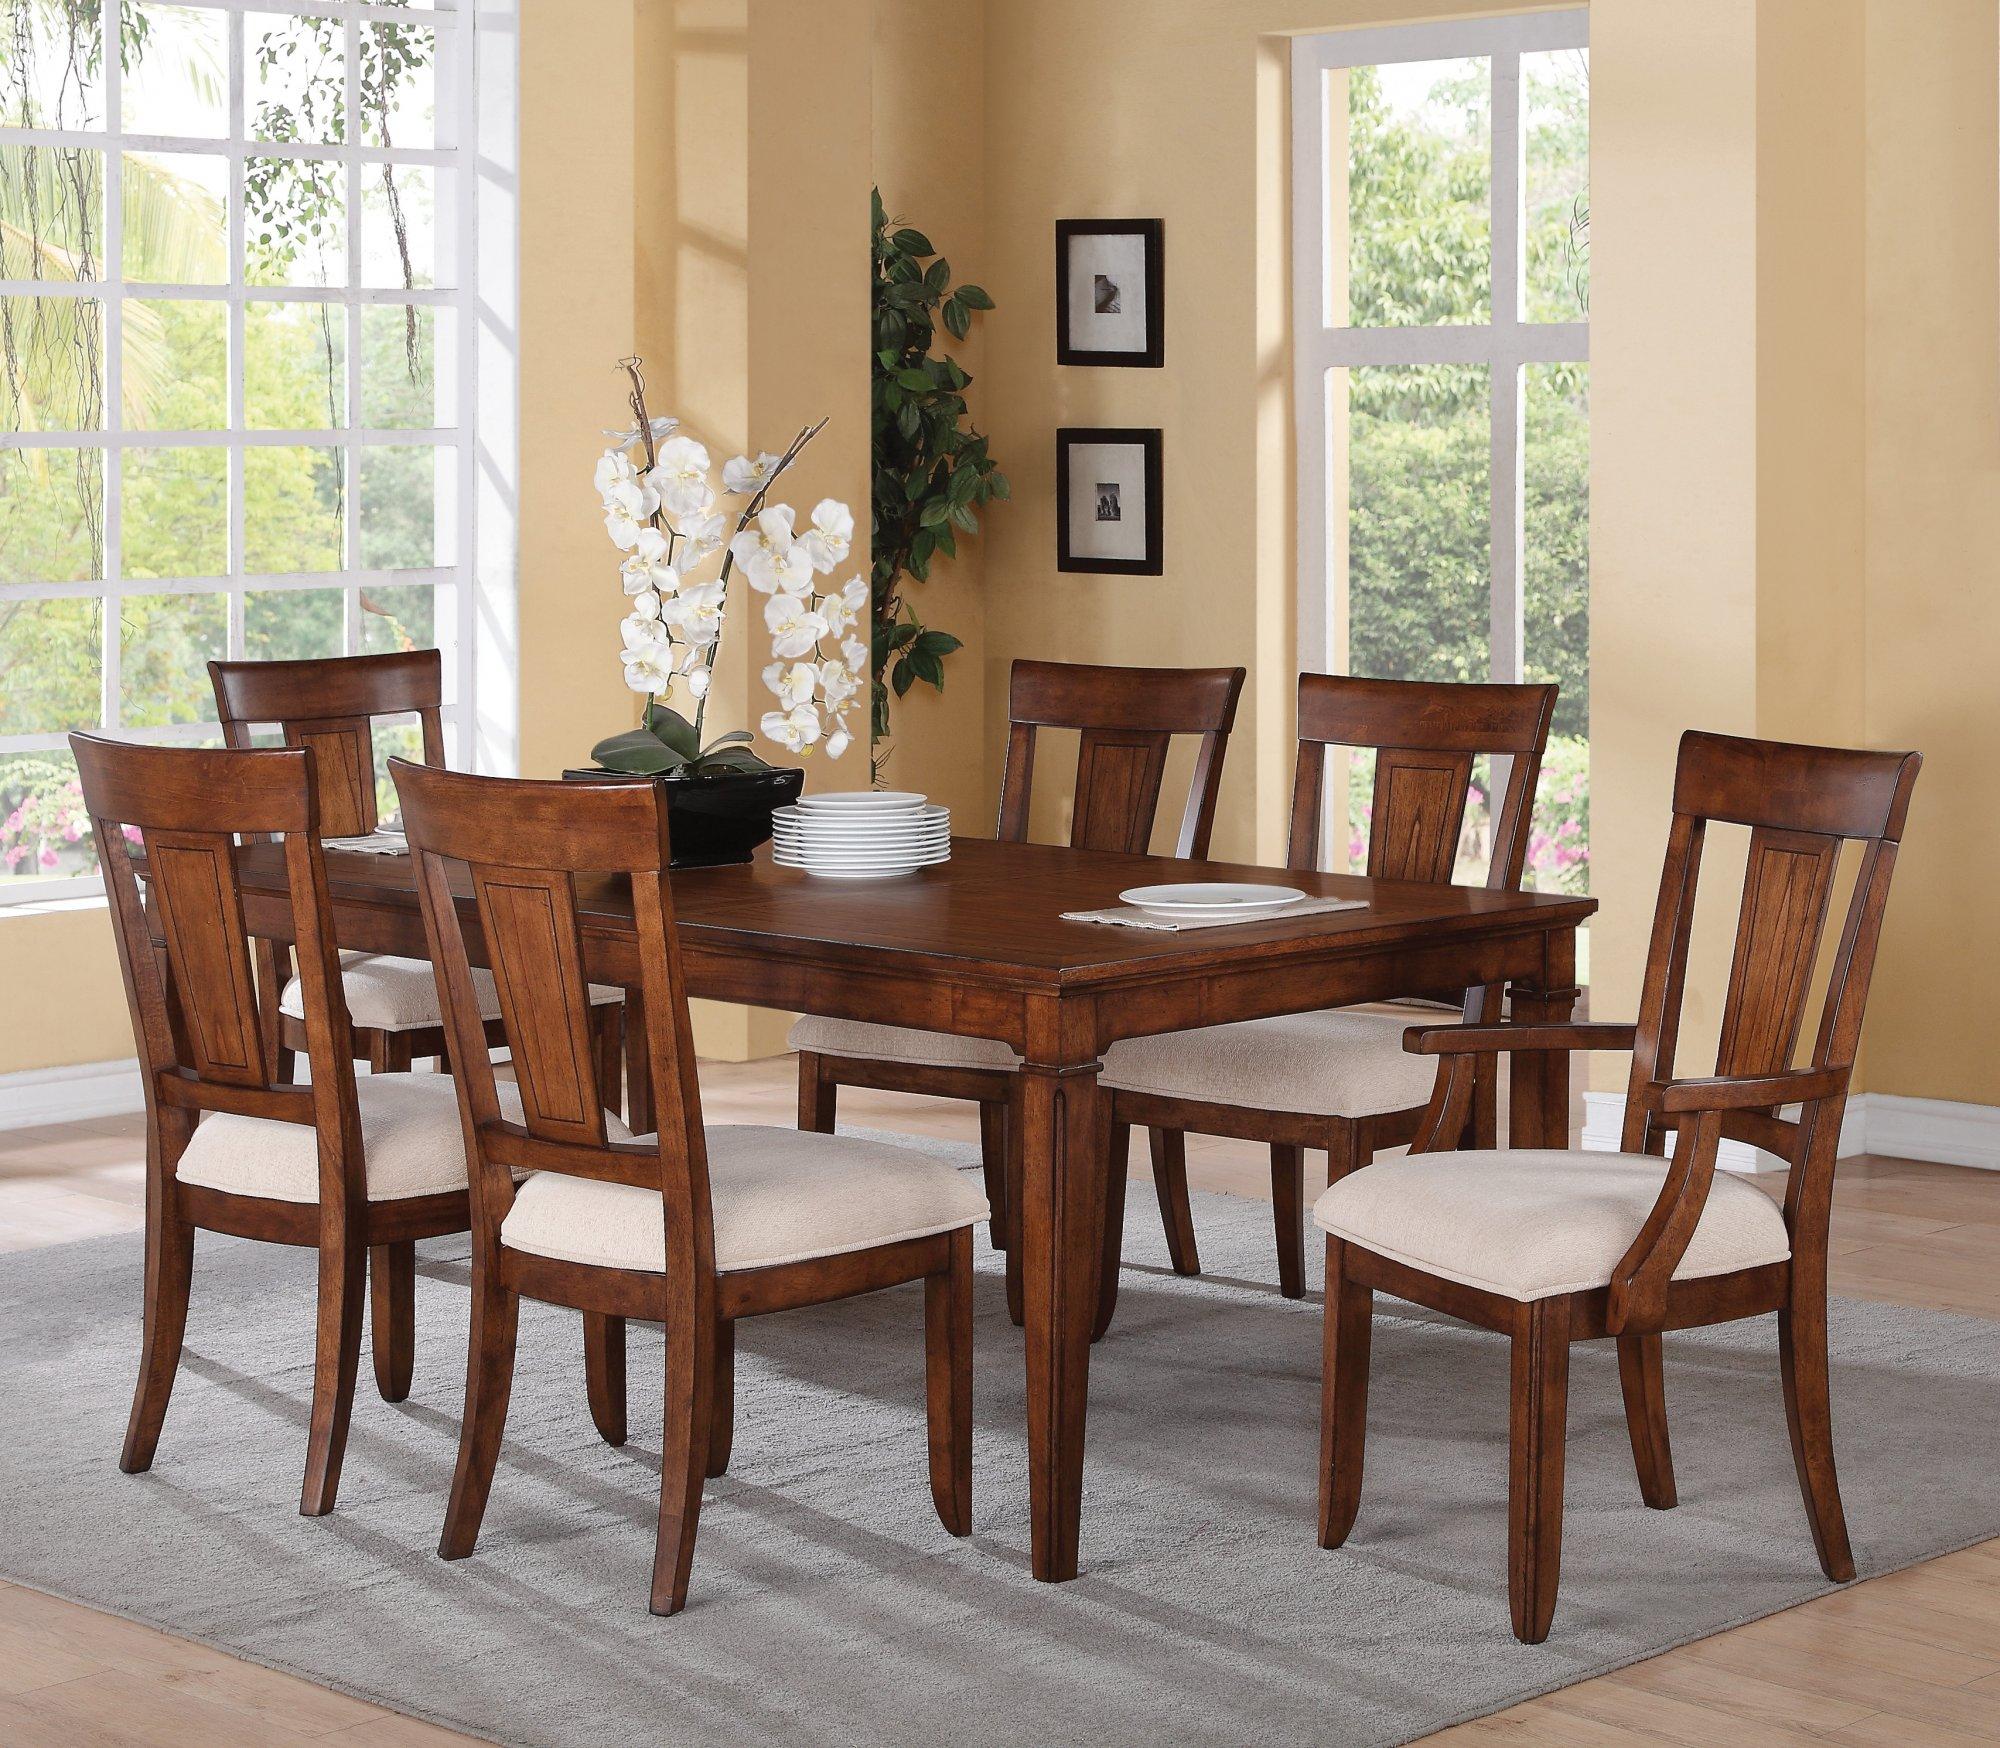 Dining Room Tables Fine Dining Tables from Flexsteel